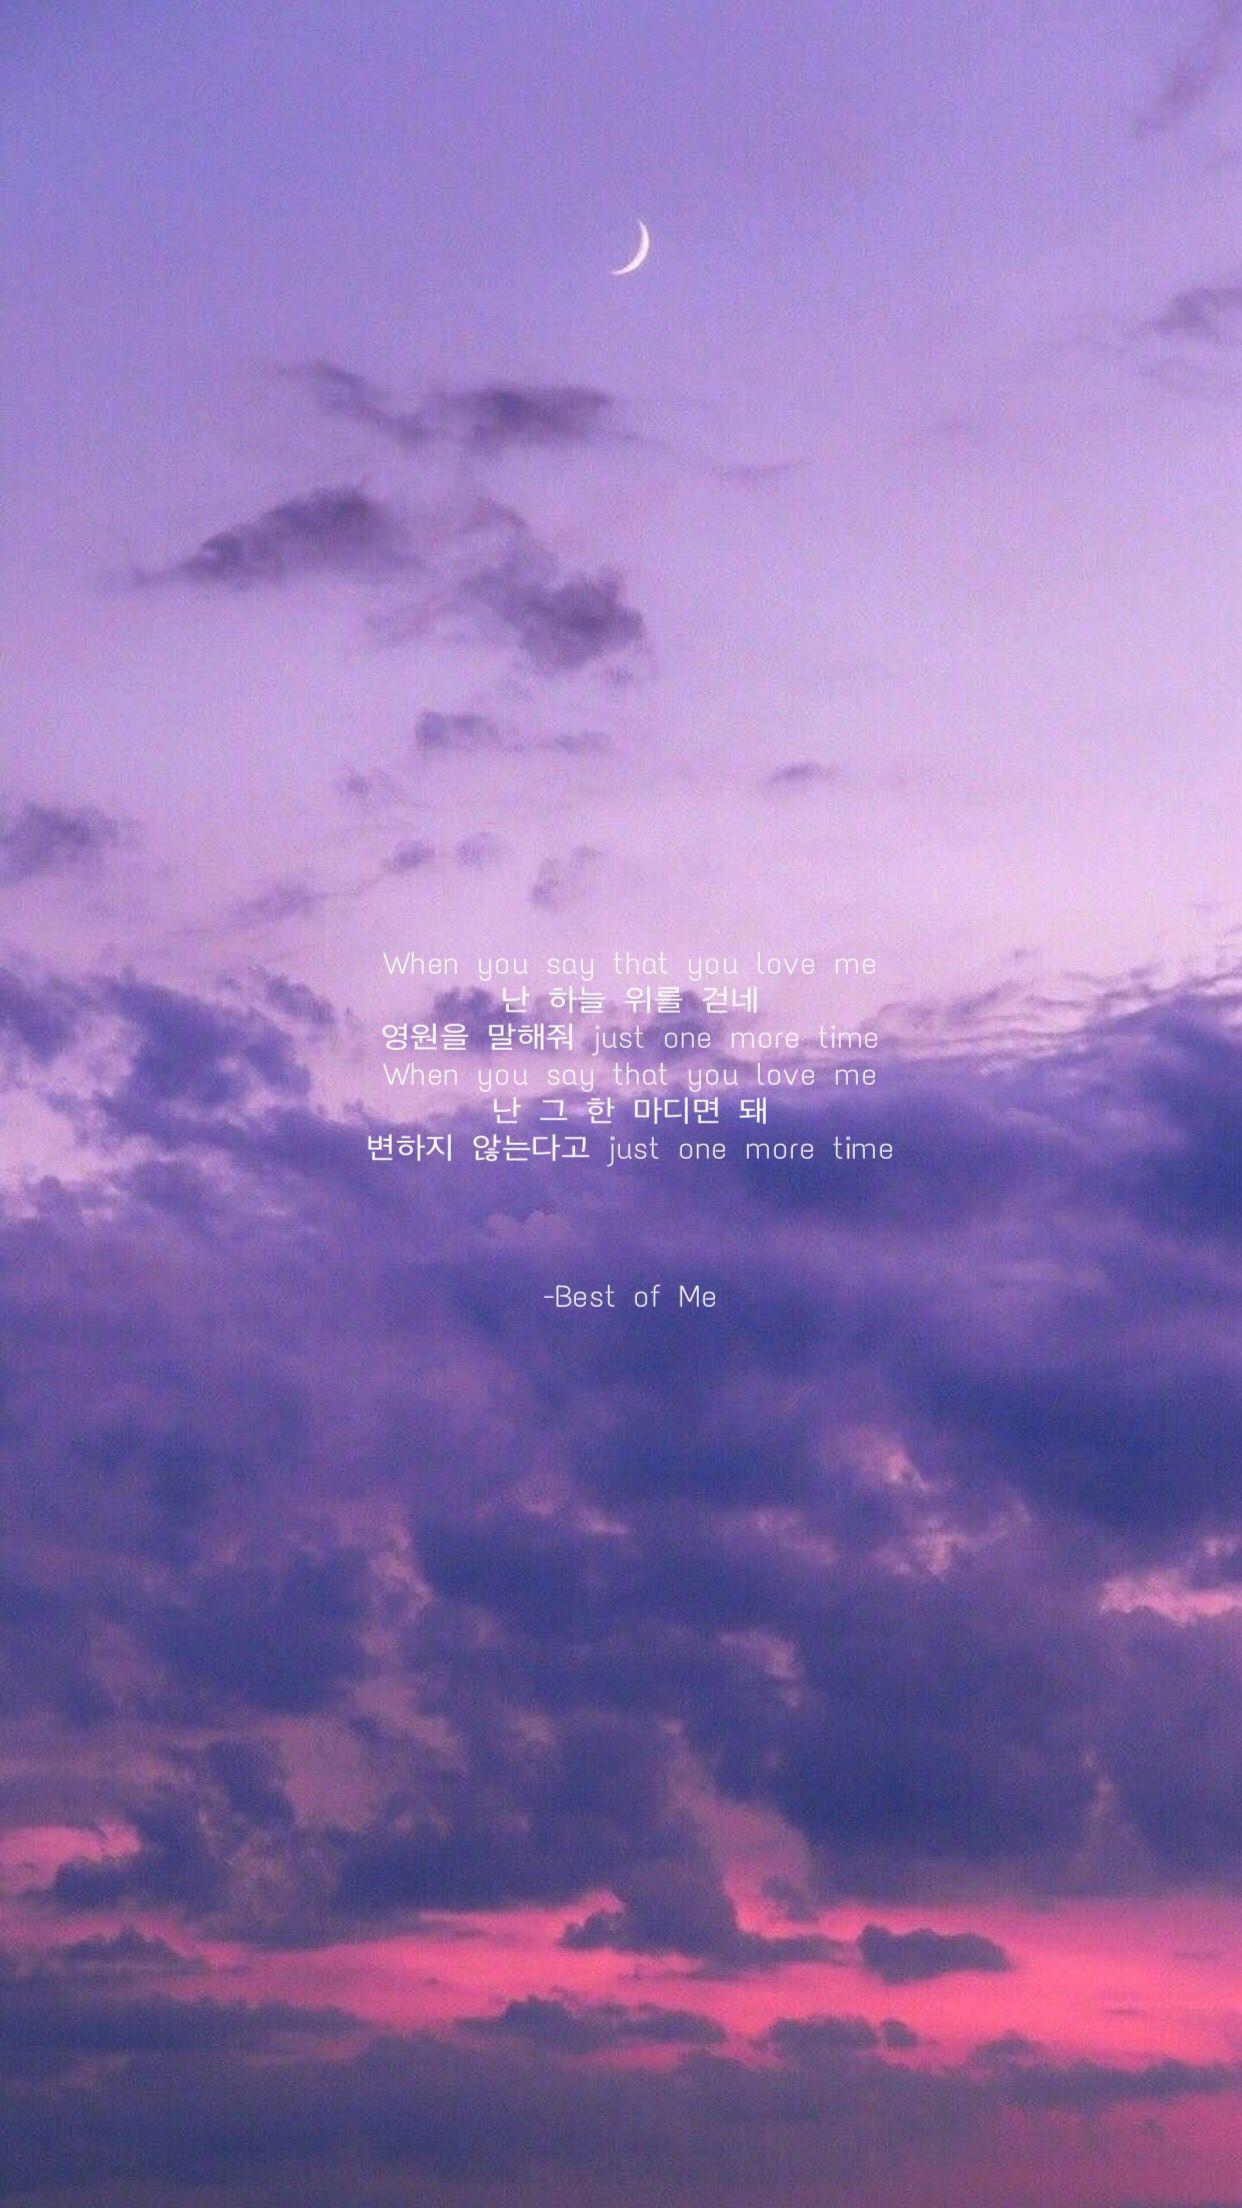 Best of Me BTS Lyrics Bts wallpaper lyrics Bts aesthetic 1242x2208